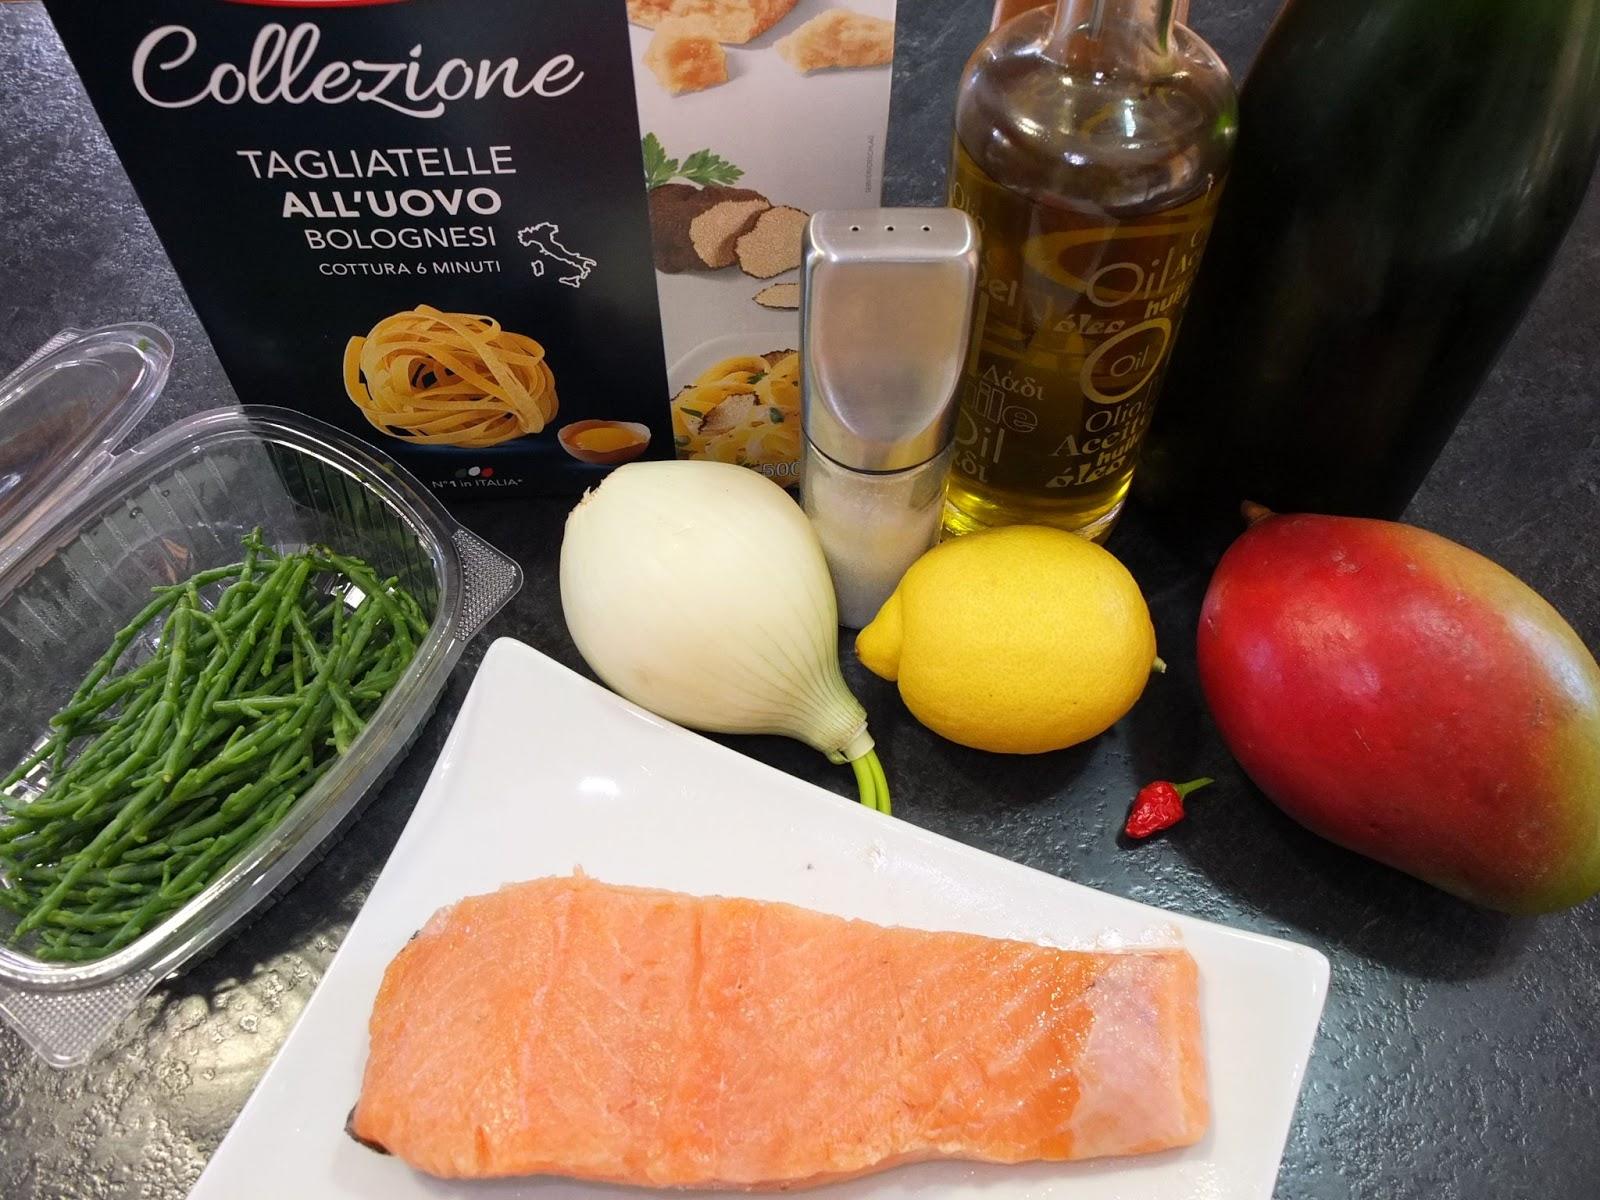 Cocinando con lola garc a tagliatelle con salm n for Cocinar con mango